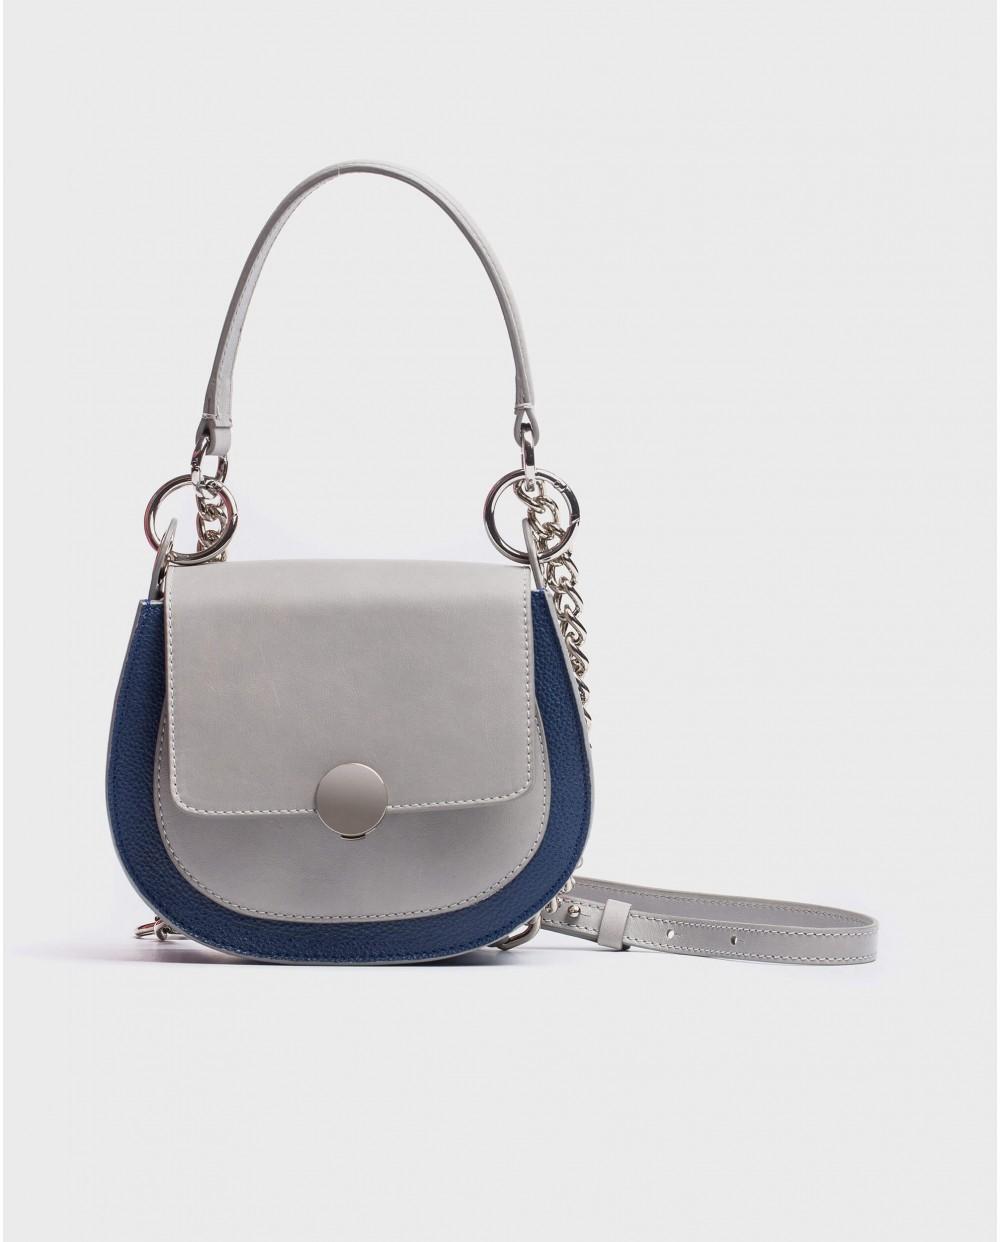 Wonders-Bags-Bicolored crossbody handbag